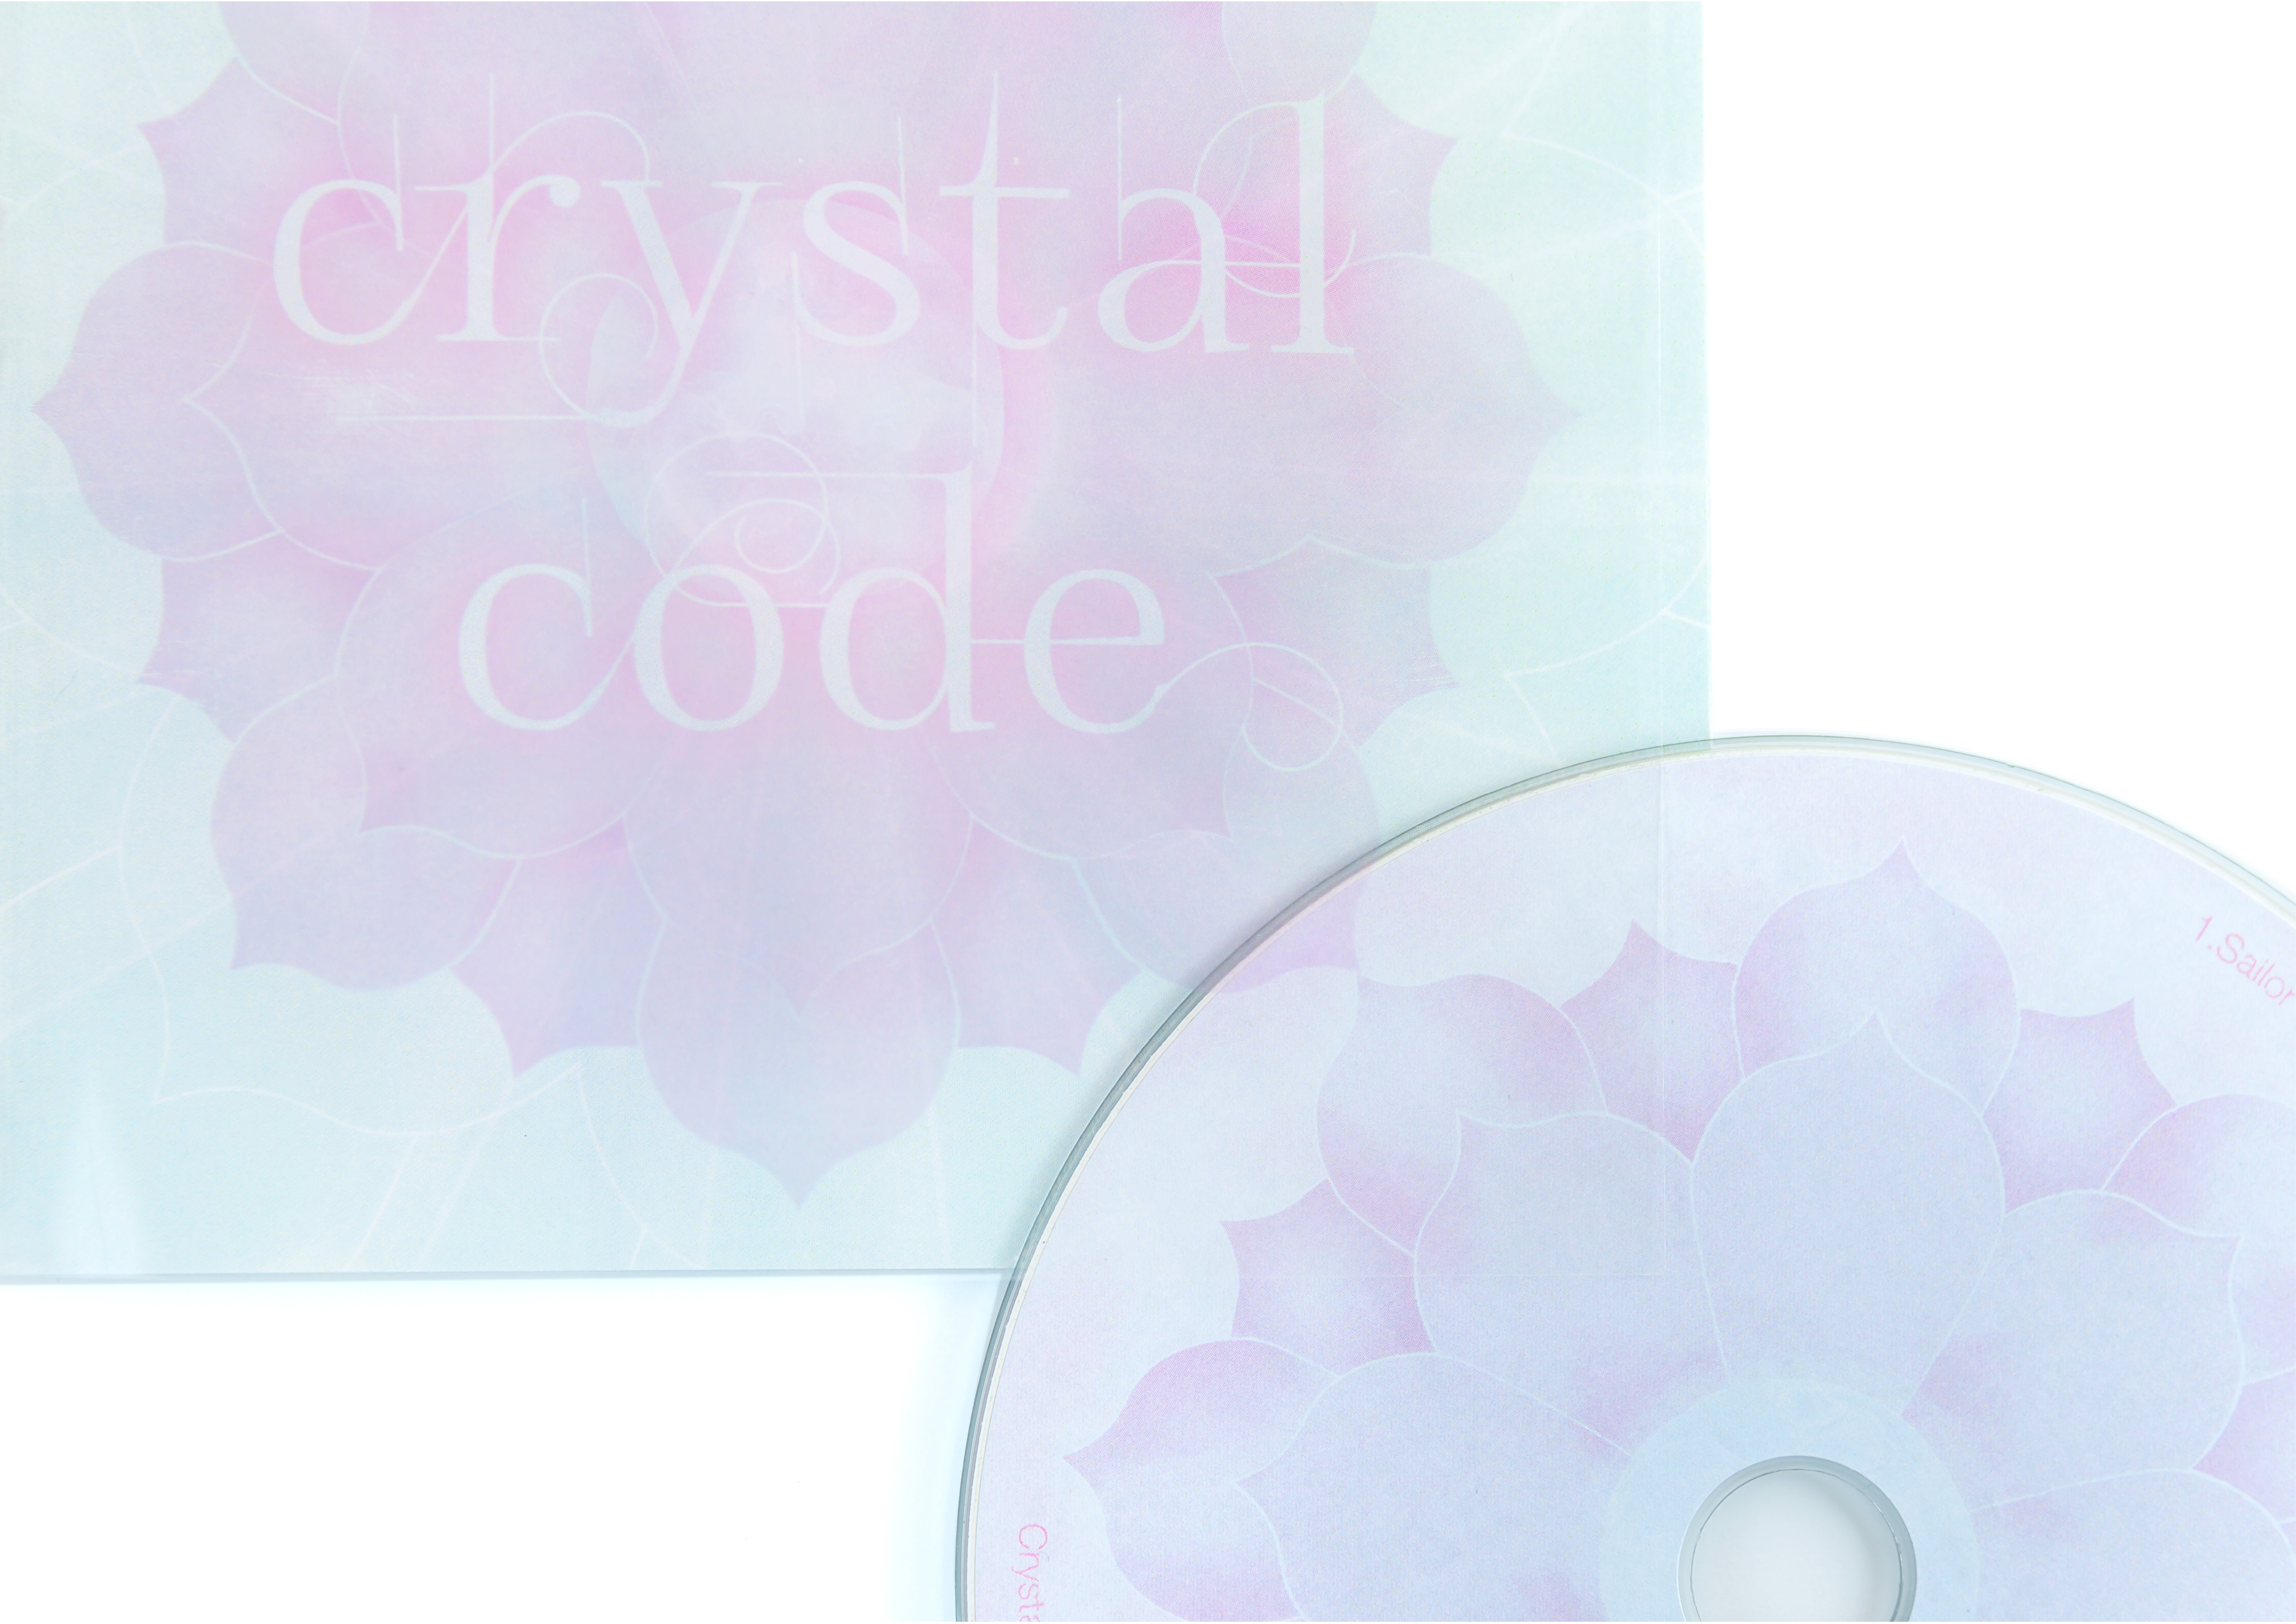 Crystal Code8